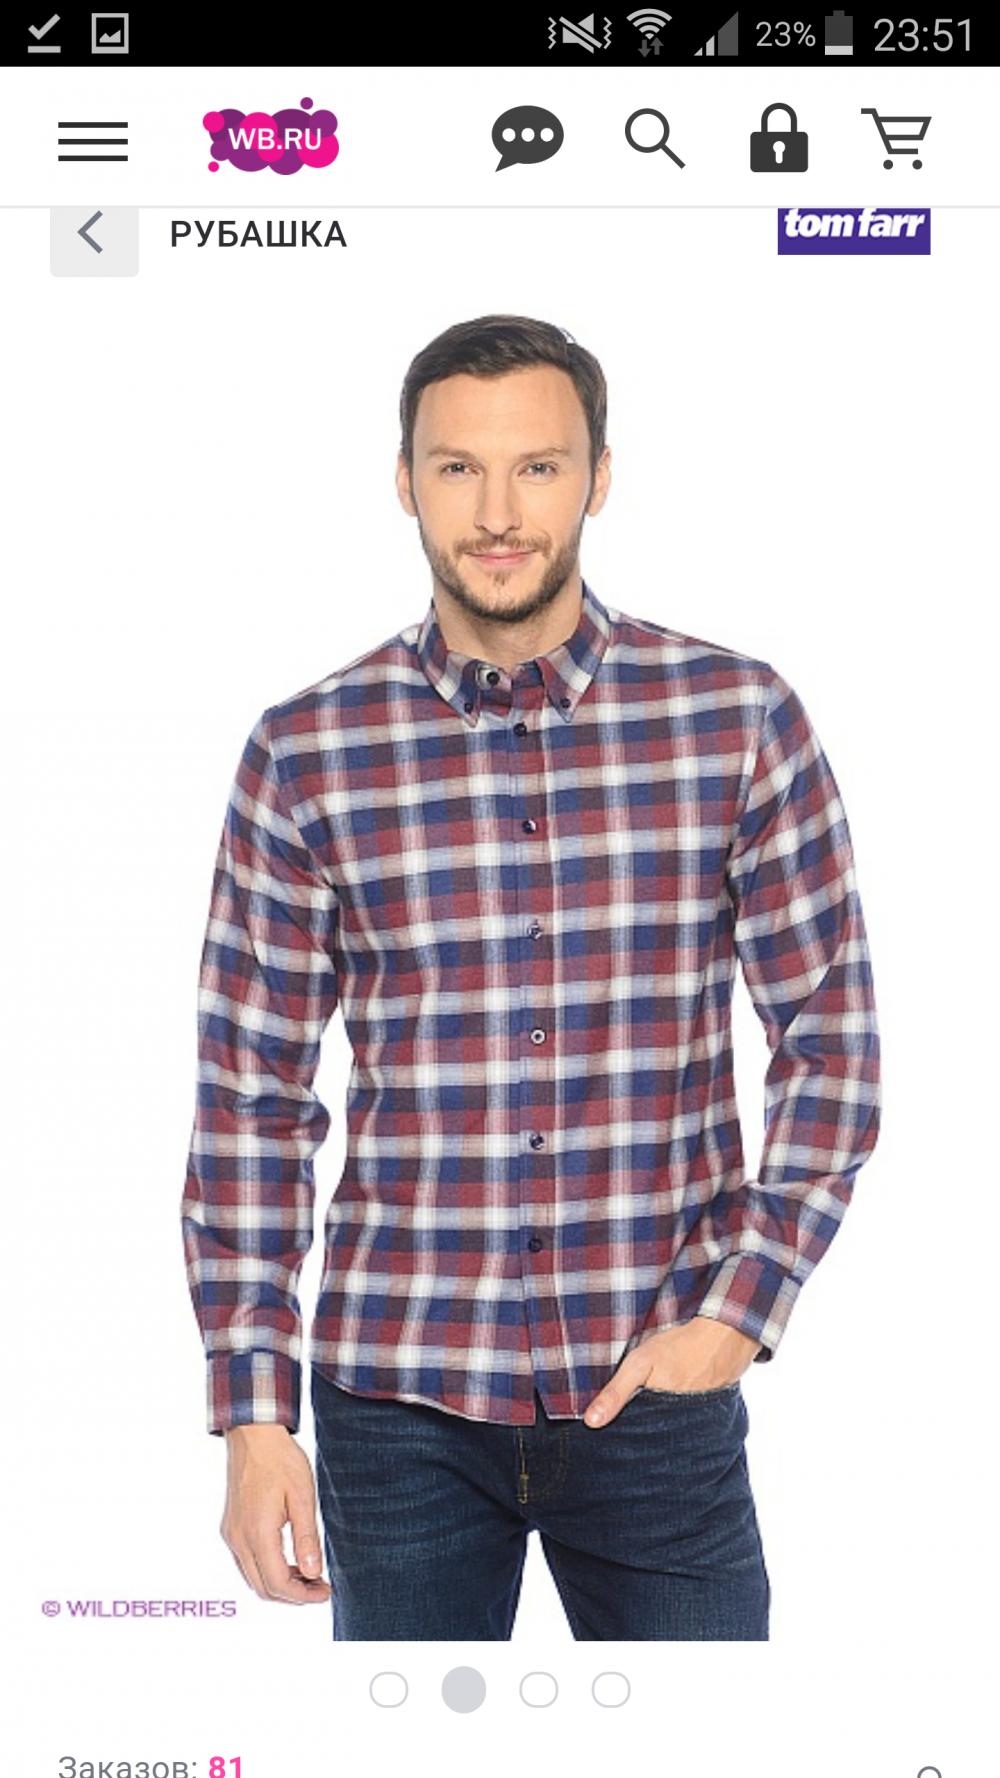 Рубашка tom farr 50 р.